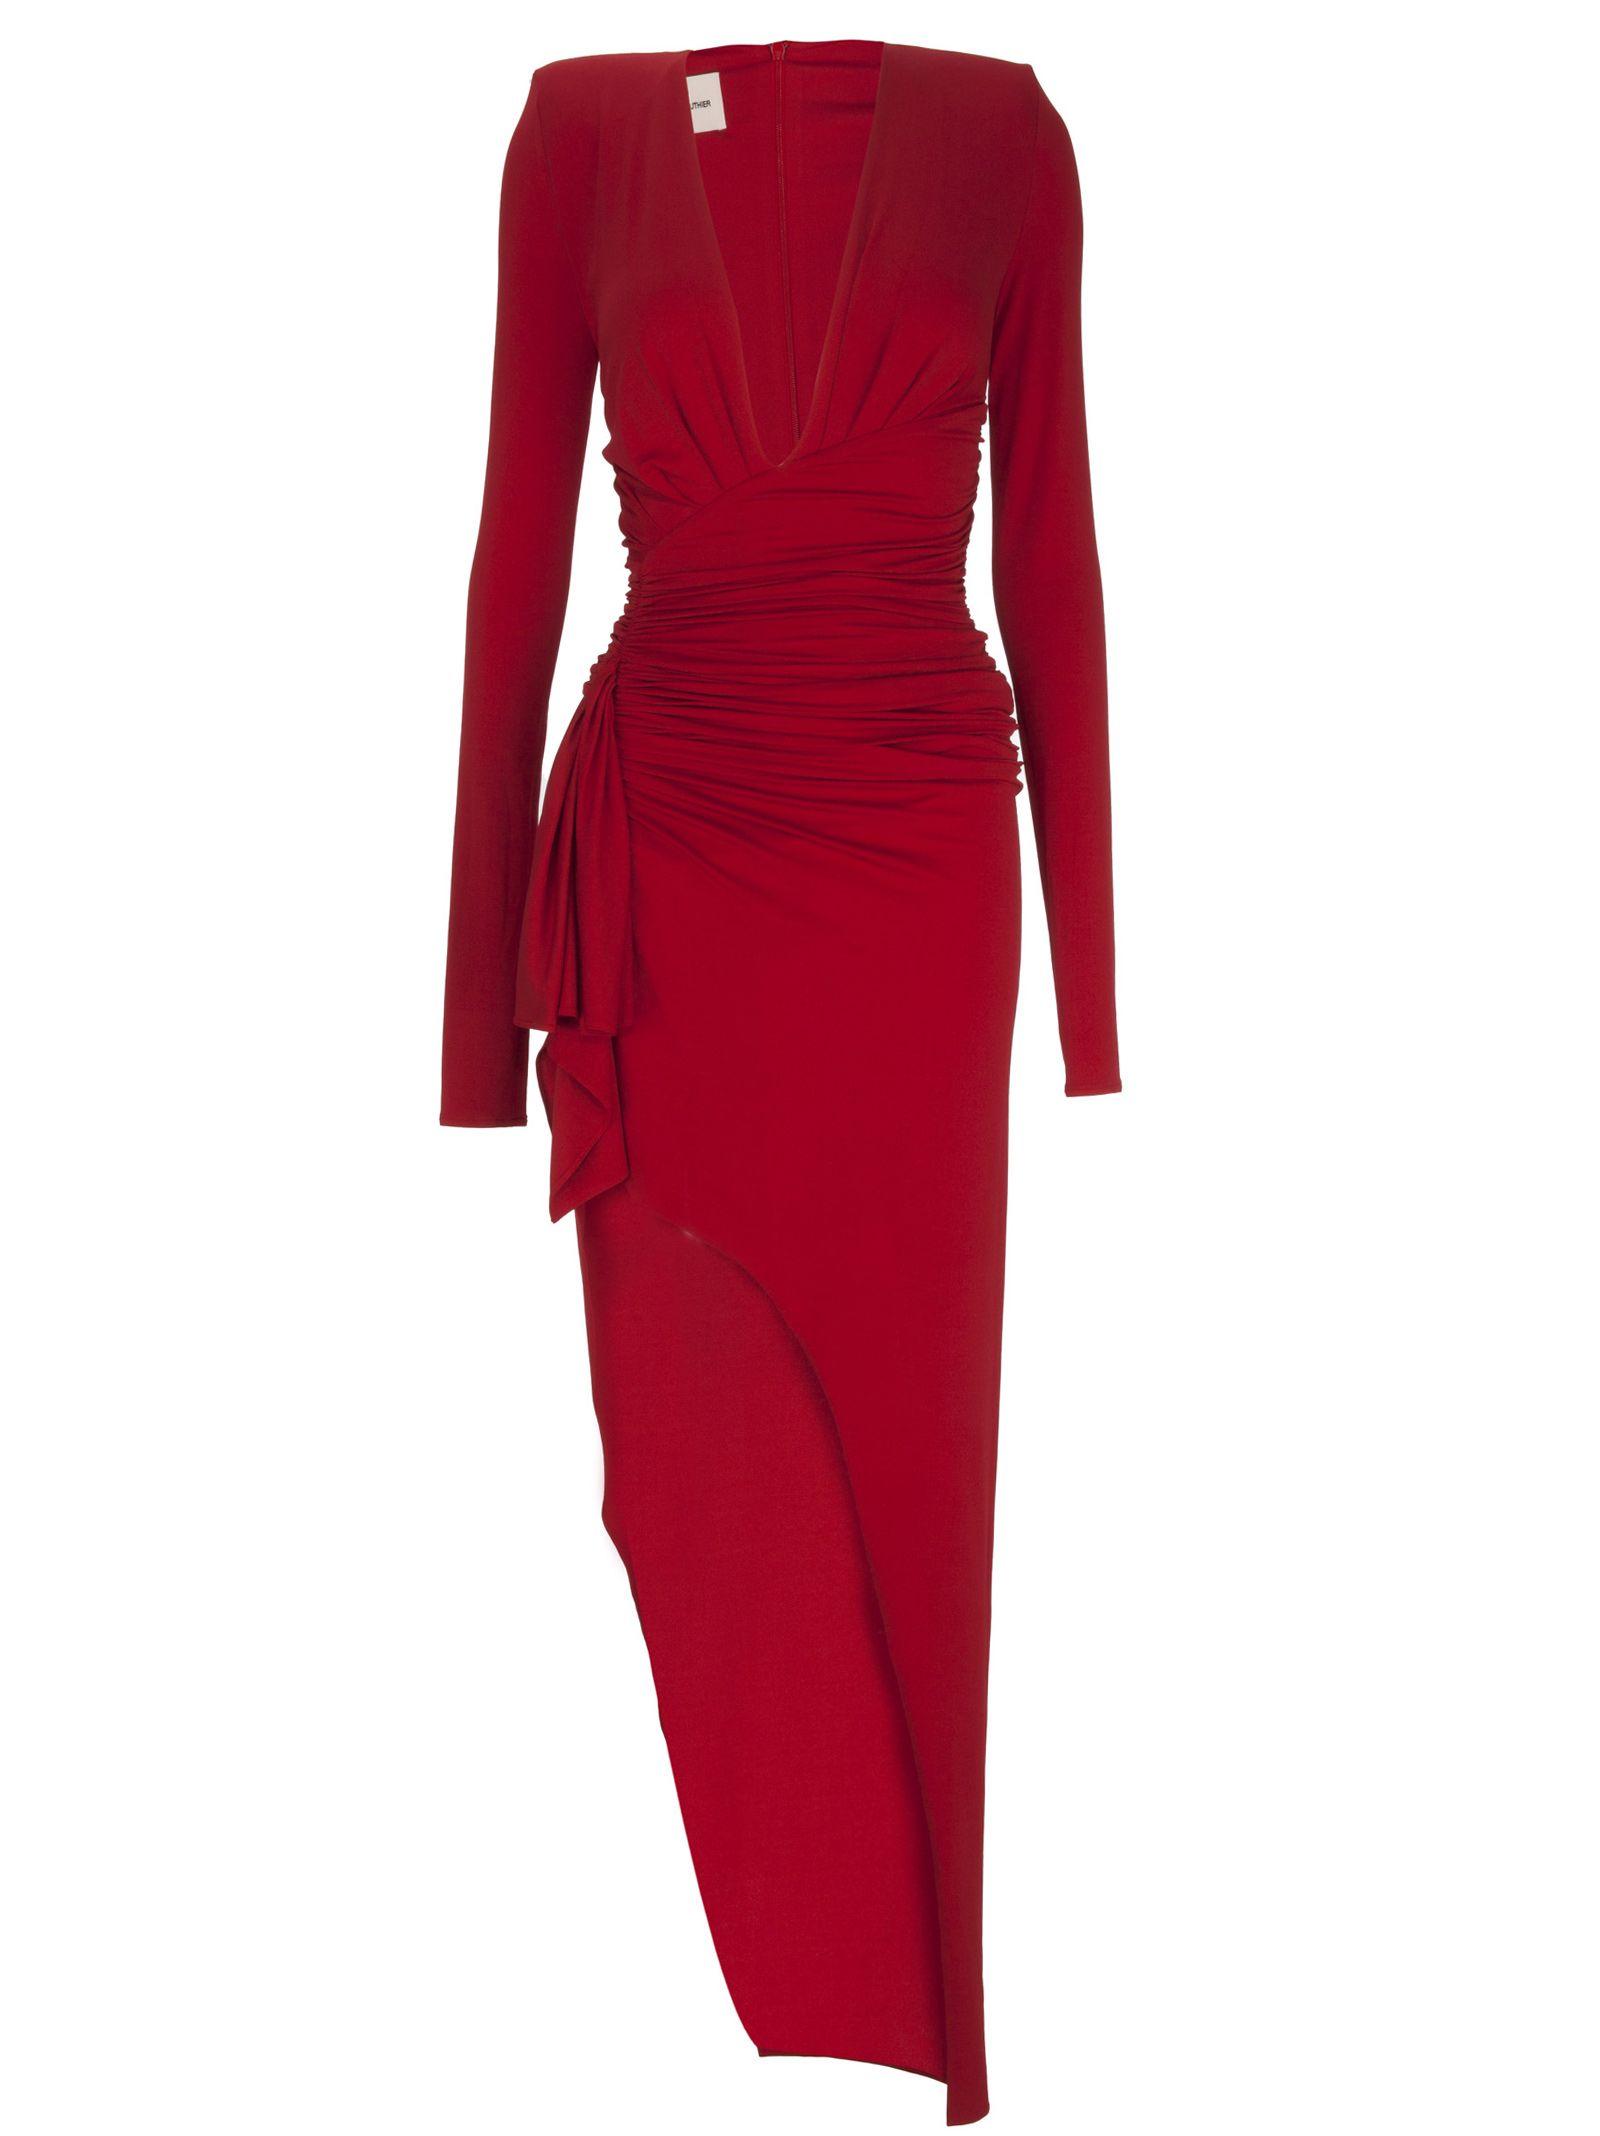 feb3eefaf9 Alexandre Vauthier Alexandre Vauthier Dress - Red - 10848756